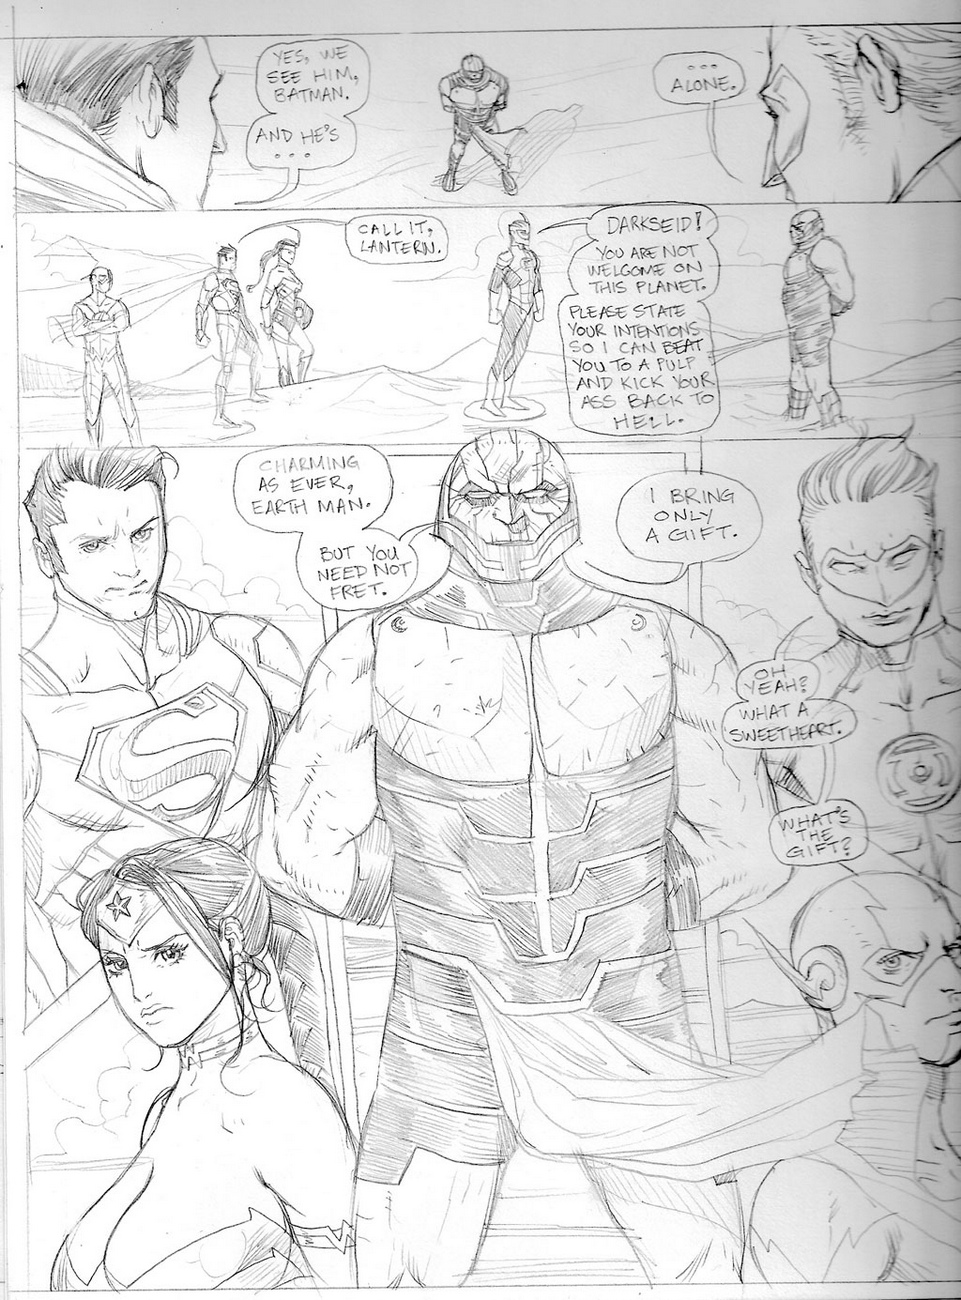 Whores-Of-Darkseid-1-Wonder-Woman 4 free sex comic